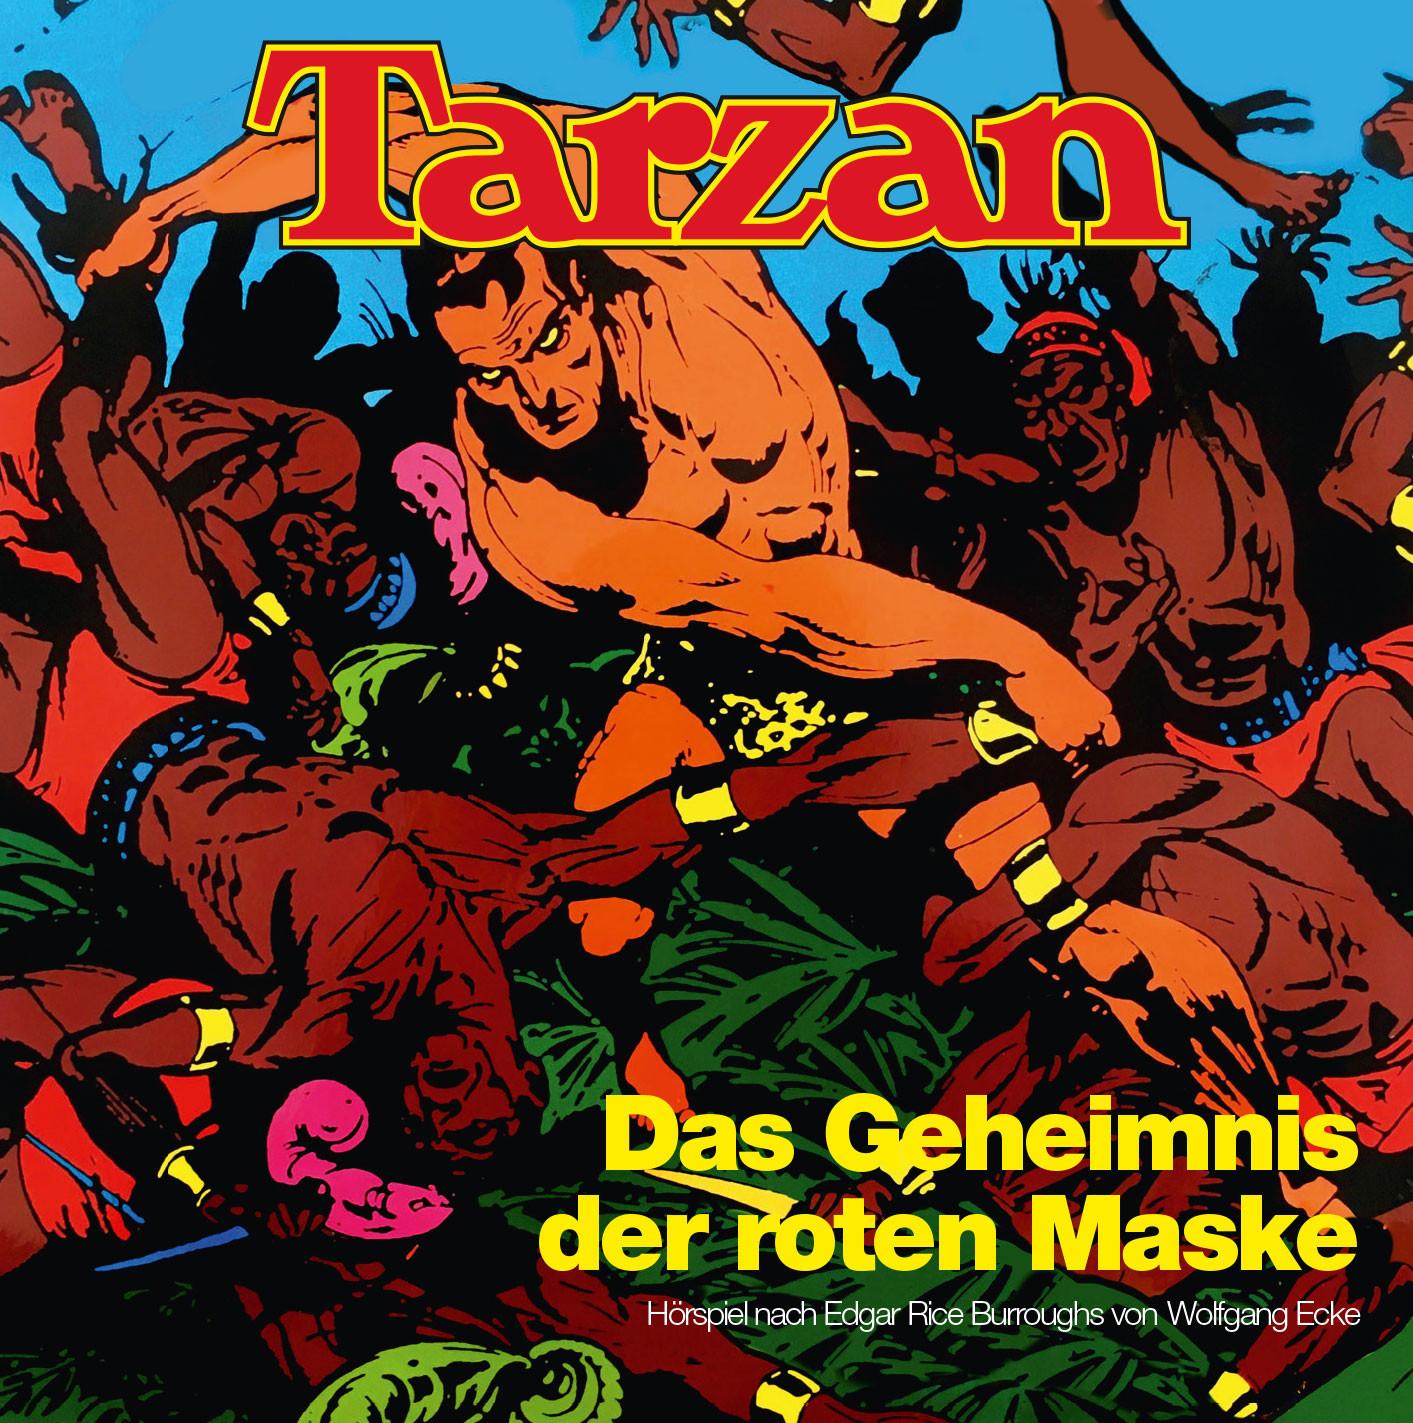 Tarzan - Folge 6: Das Geheimnis der roten Maske (CD)